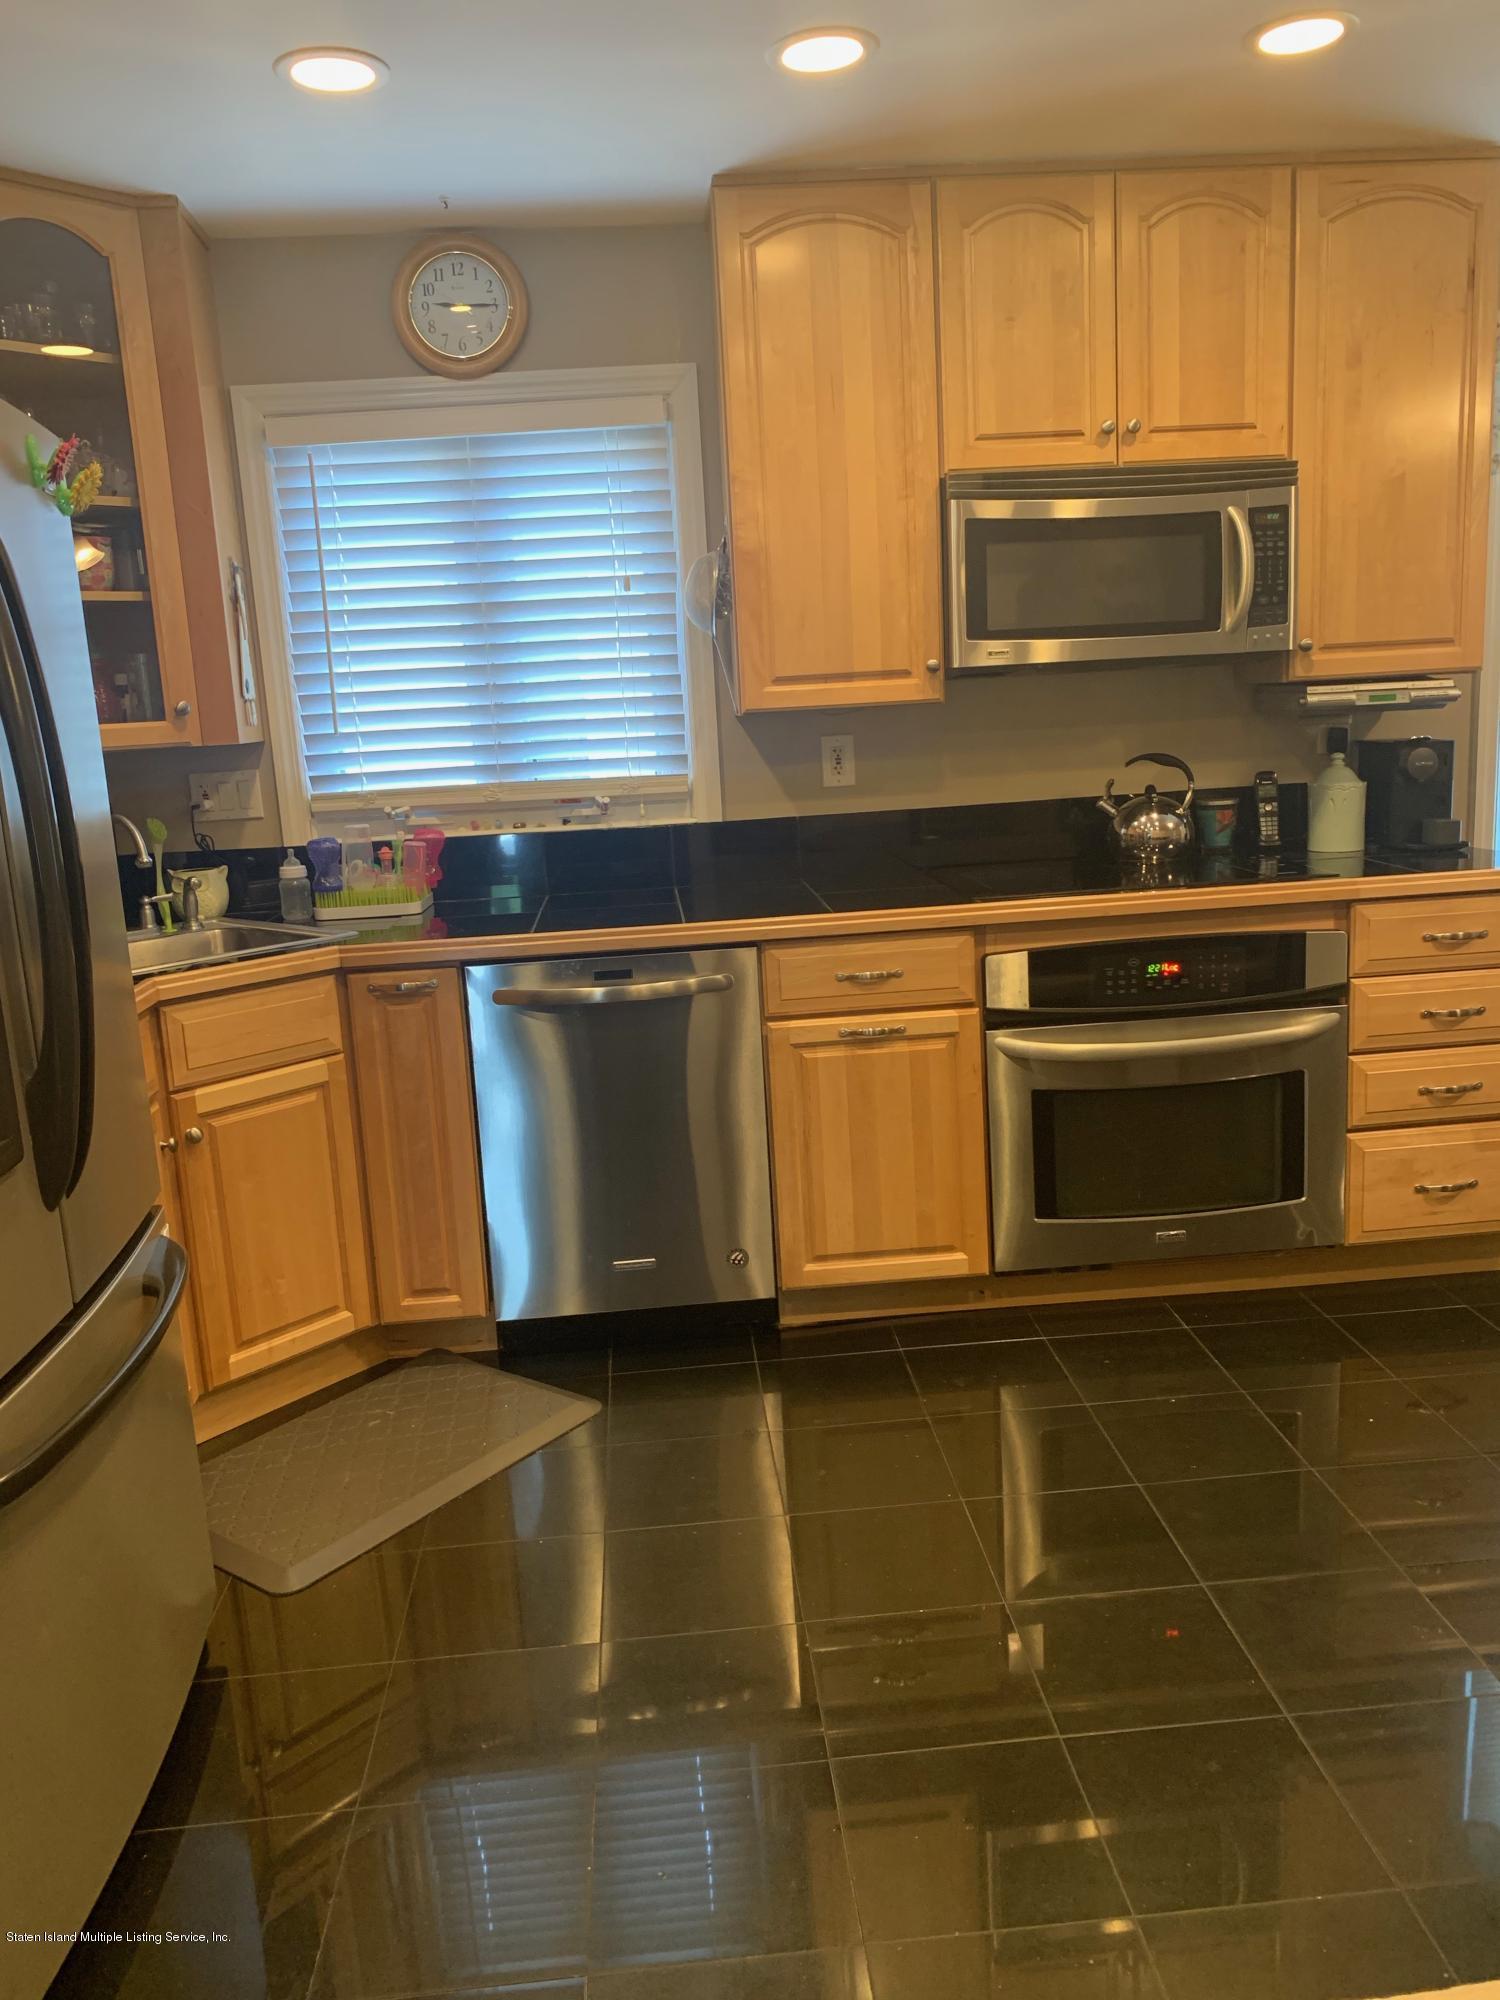 Single Family - Detached 104 Auburn Avenue  Staten Island, NY 10314, MLS-1130226-5